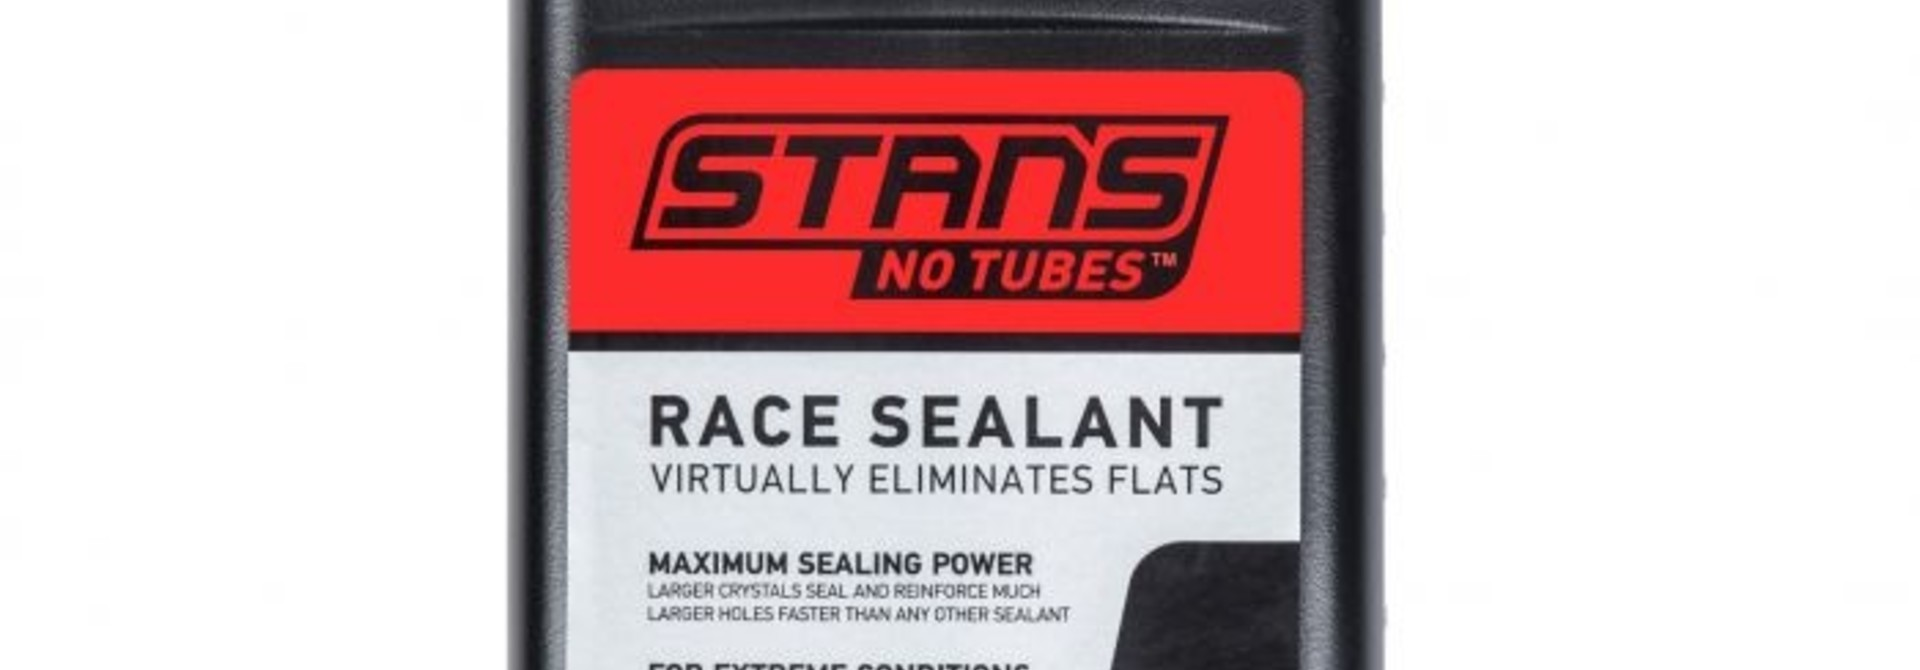 Stans No Tubes Race Sealant 32oz/944ml